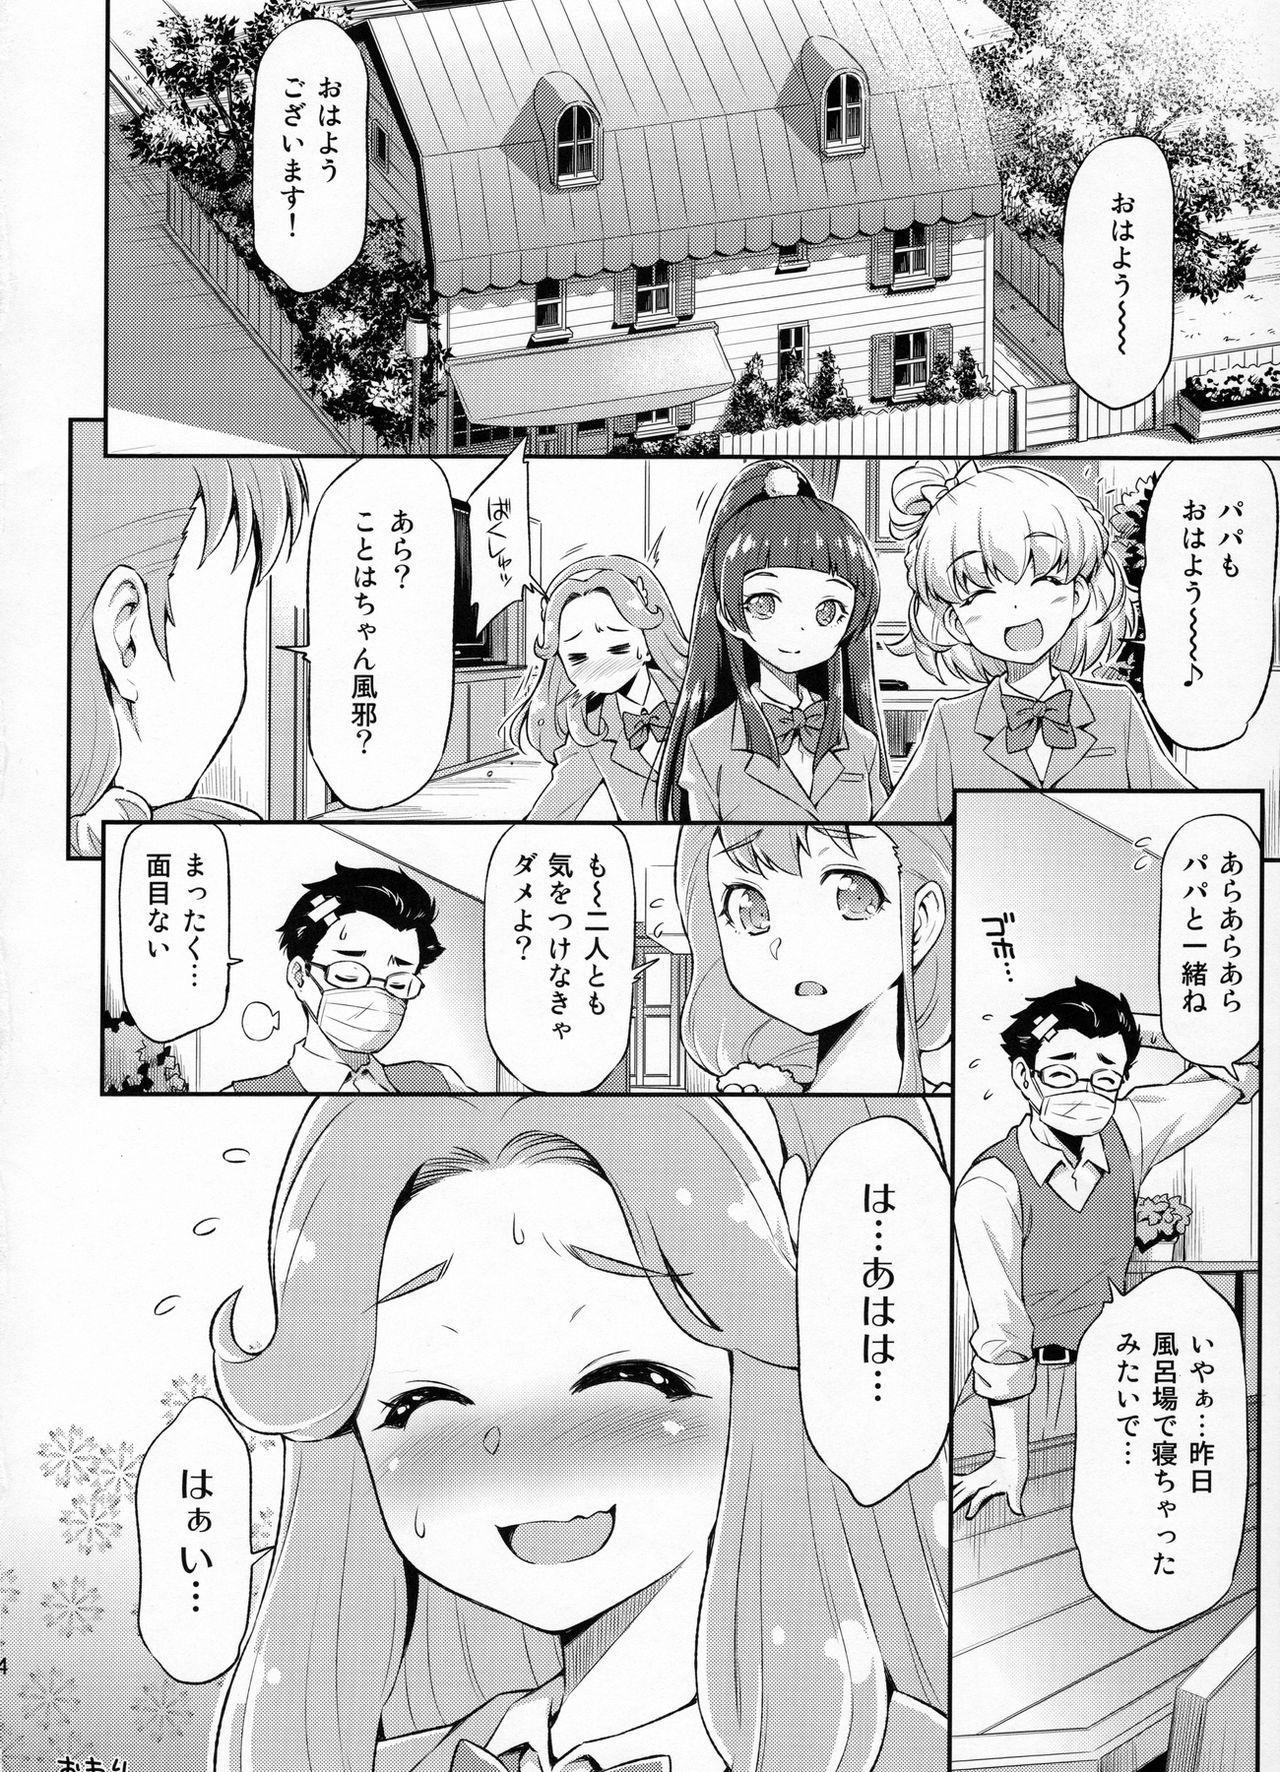 Haa-chan to Furo ni Haireba. 22